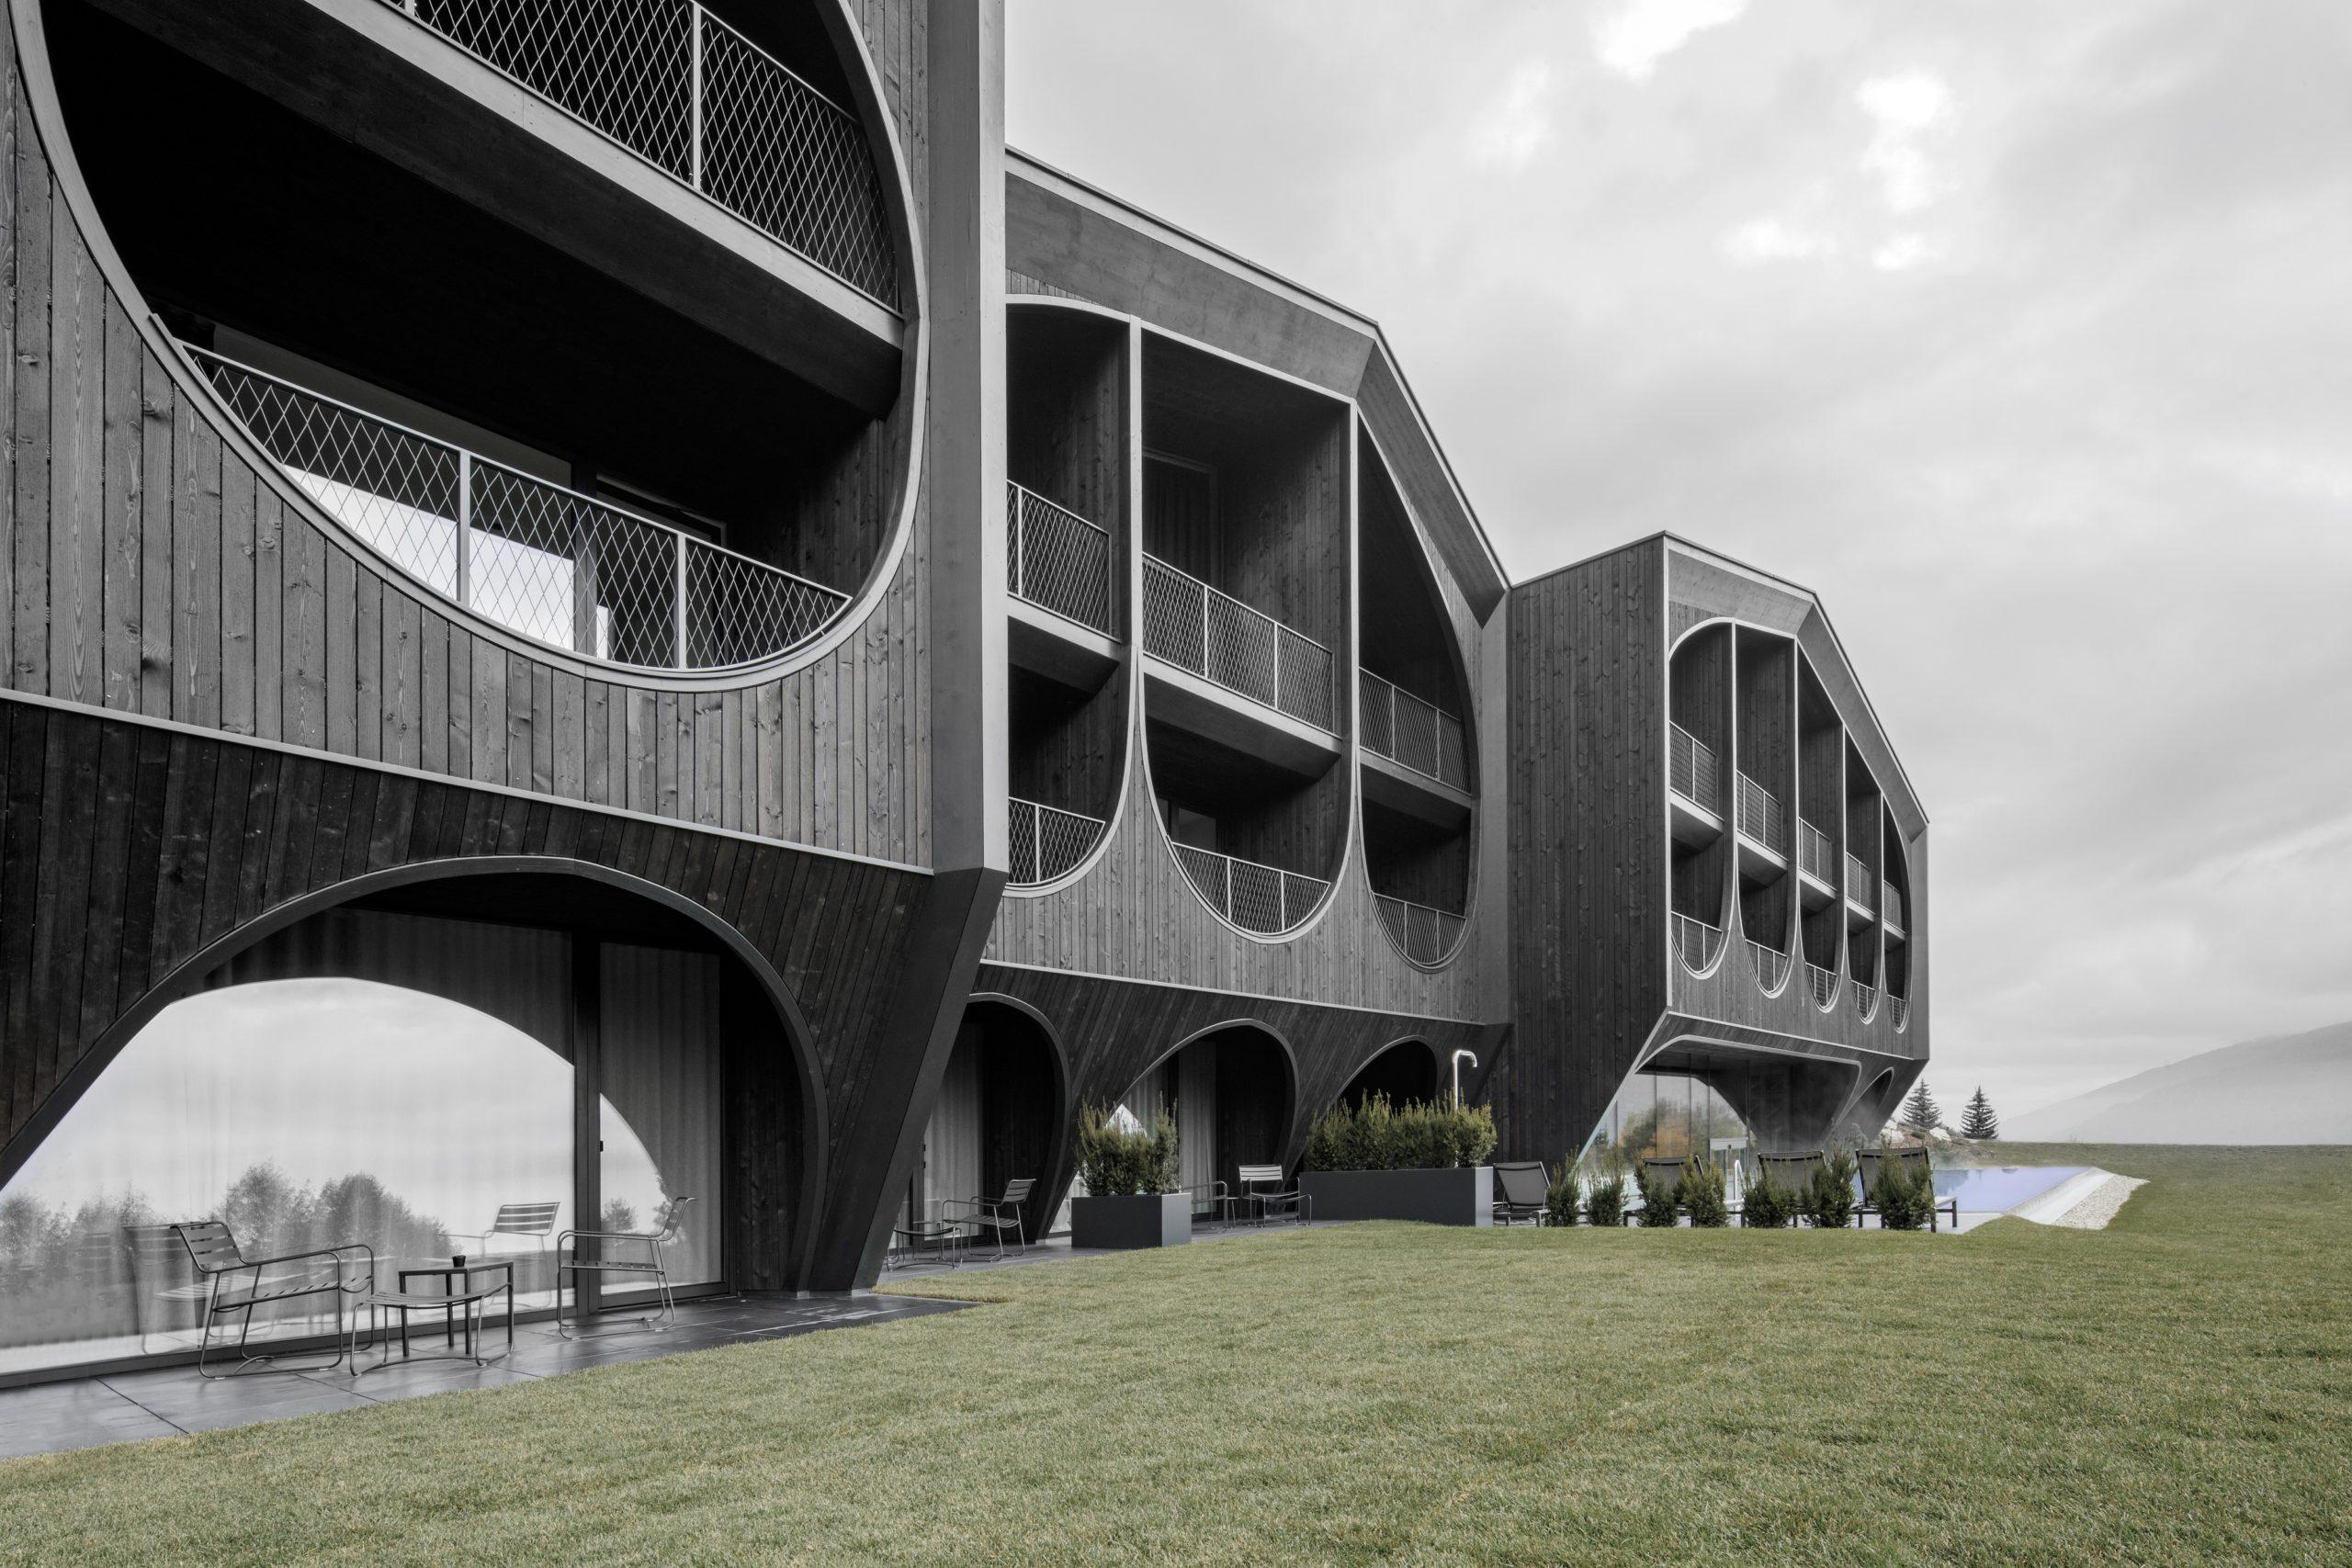 arch Hotel Milla Montis by Peter Pichler Architecture, Maranza, Italy